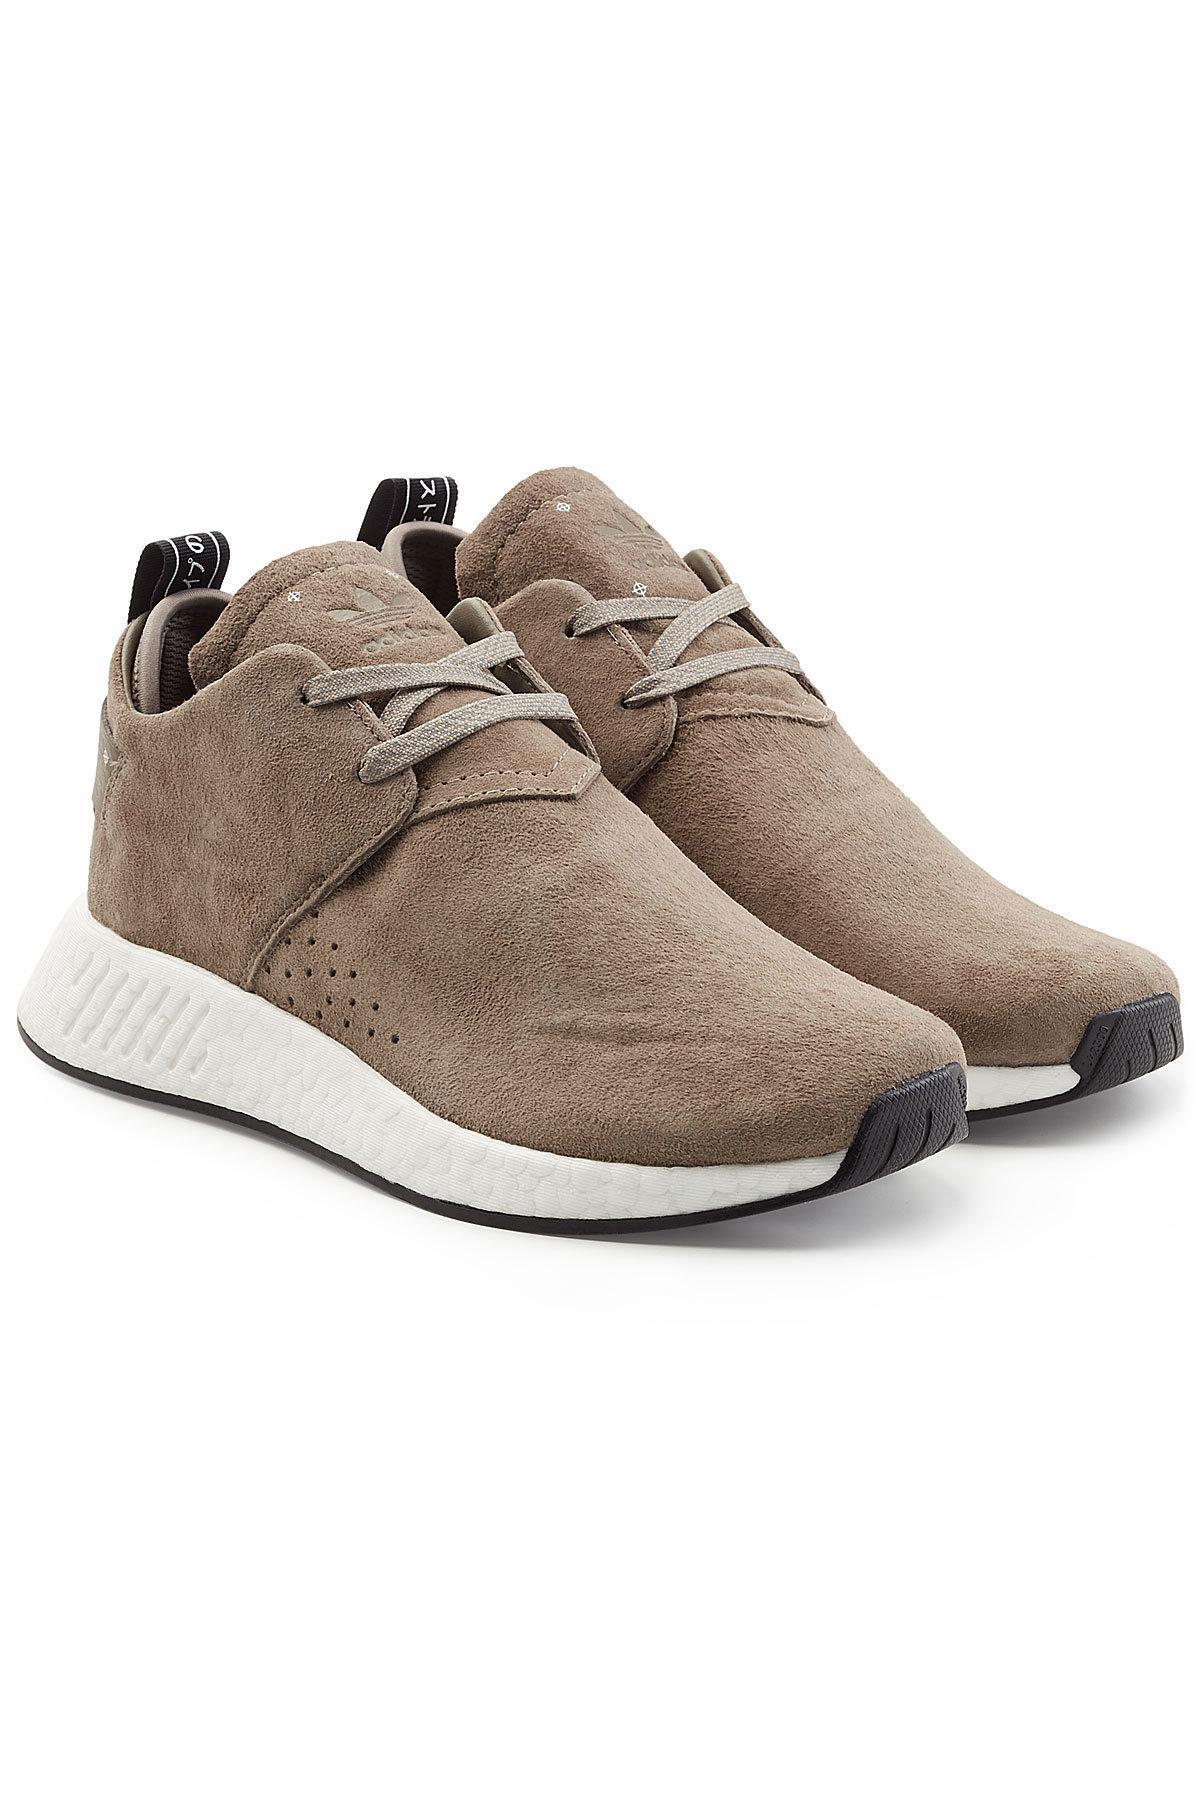 50bab8c7fdace adidas Originals Nmd C2 Suede Sneakers for Men - Lyst